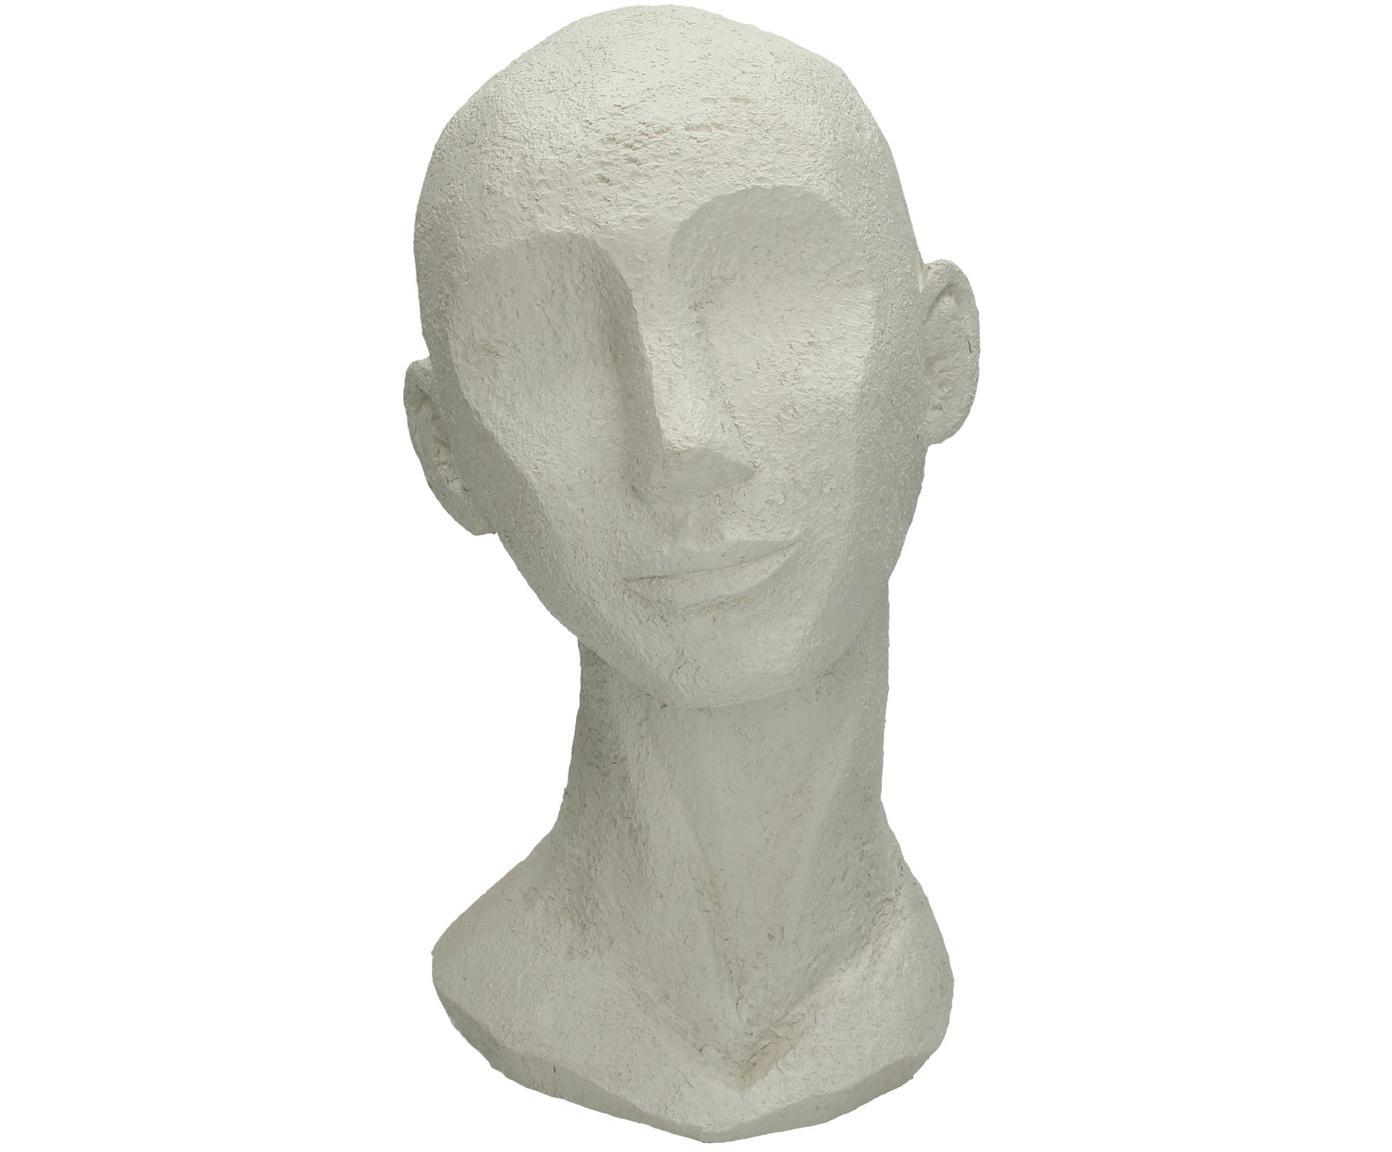 Deko-Objekt Head, Polyresin, Gebrochenes Weiß, 18 x 28 cm